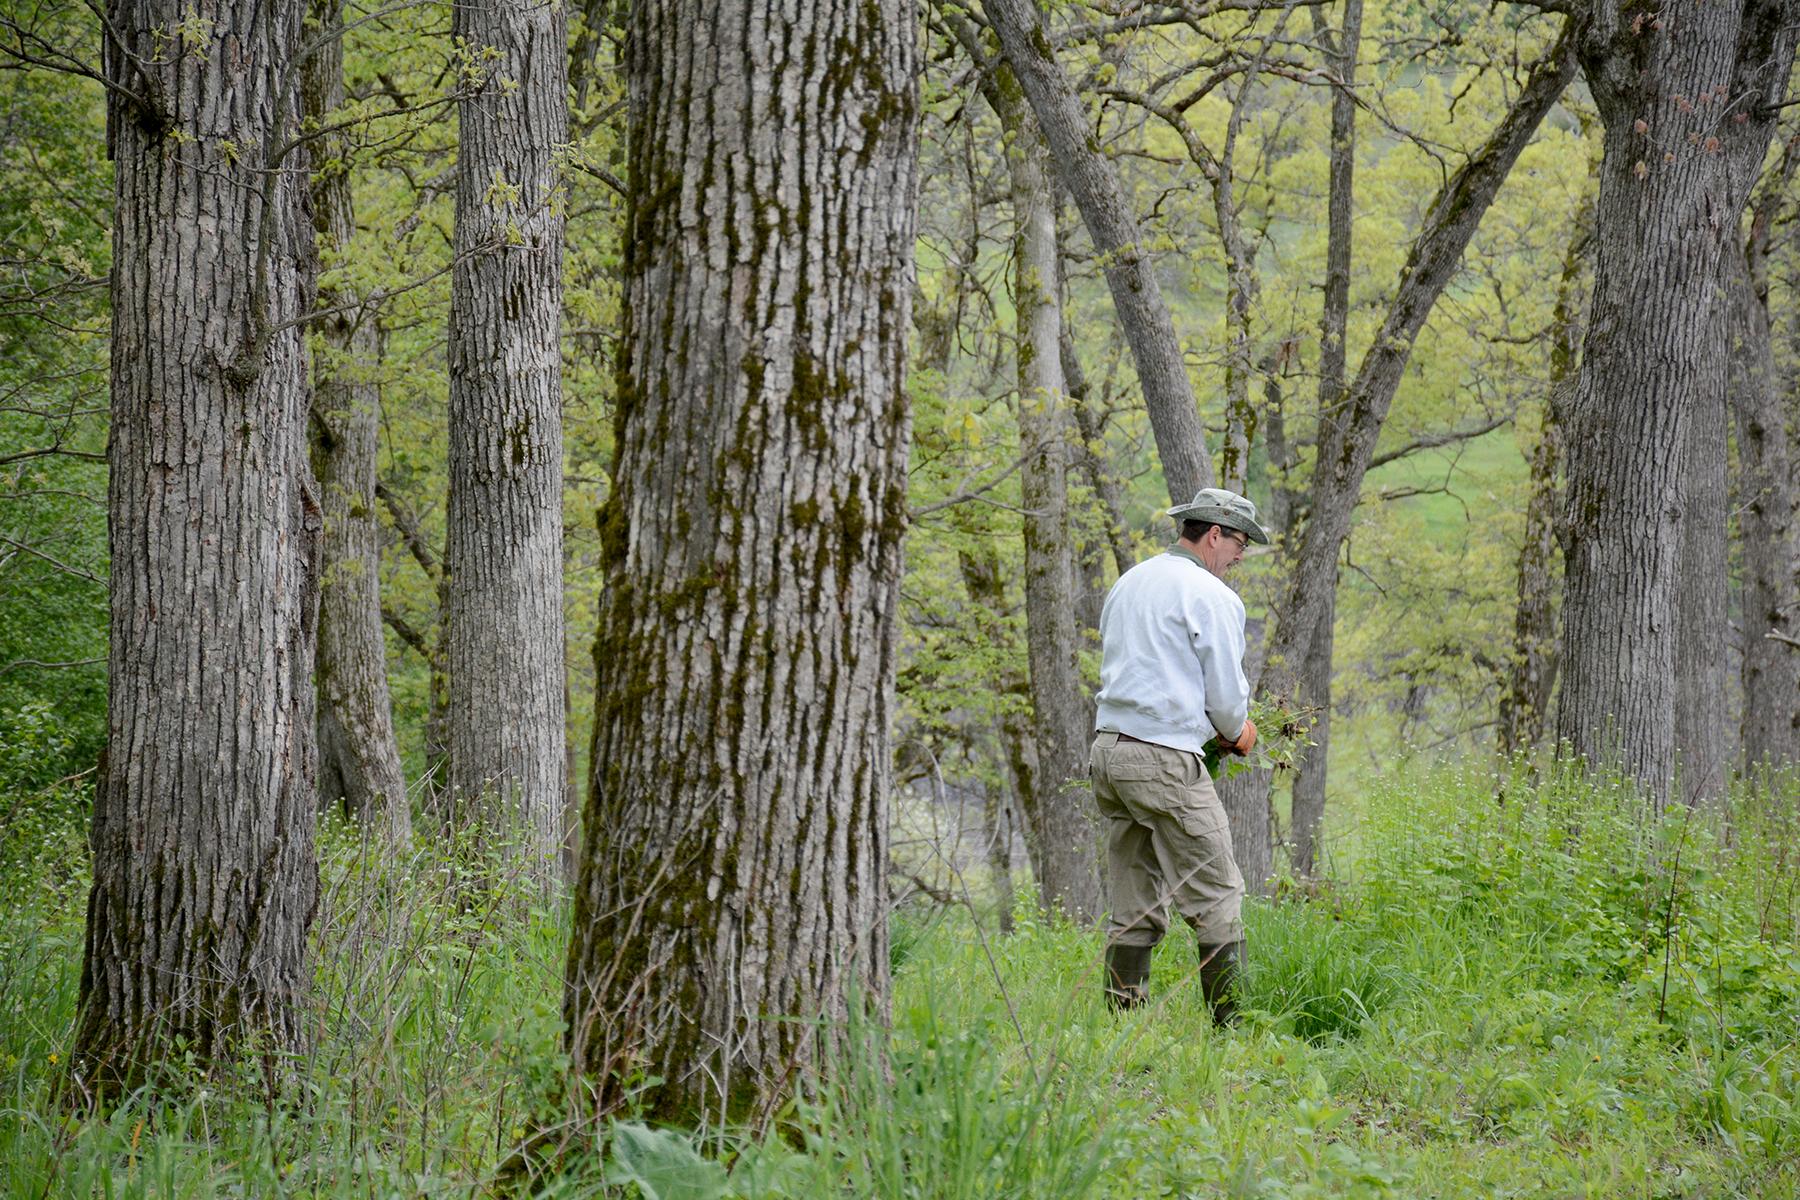 Jim Lesniak pulls invasive garlic mustard between towering trees during a volunteer work day at Muehllehner Addition - Barneveld Prairie, Wis. May 14, 2016.